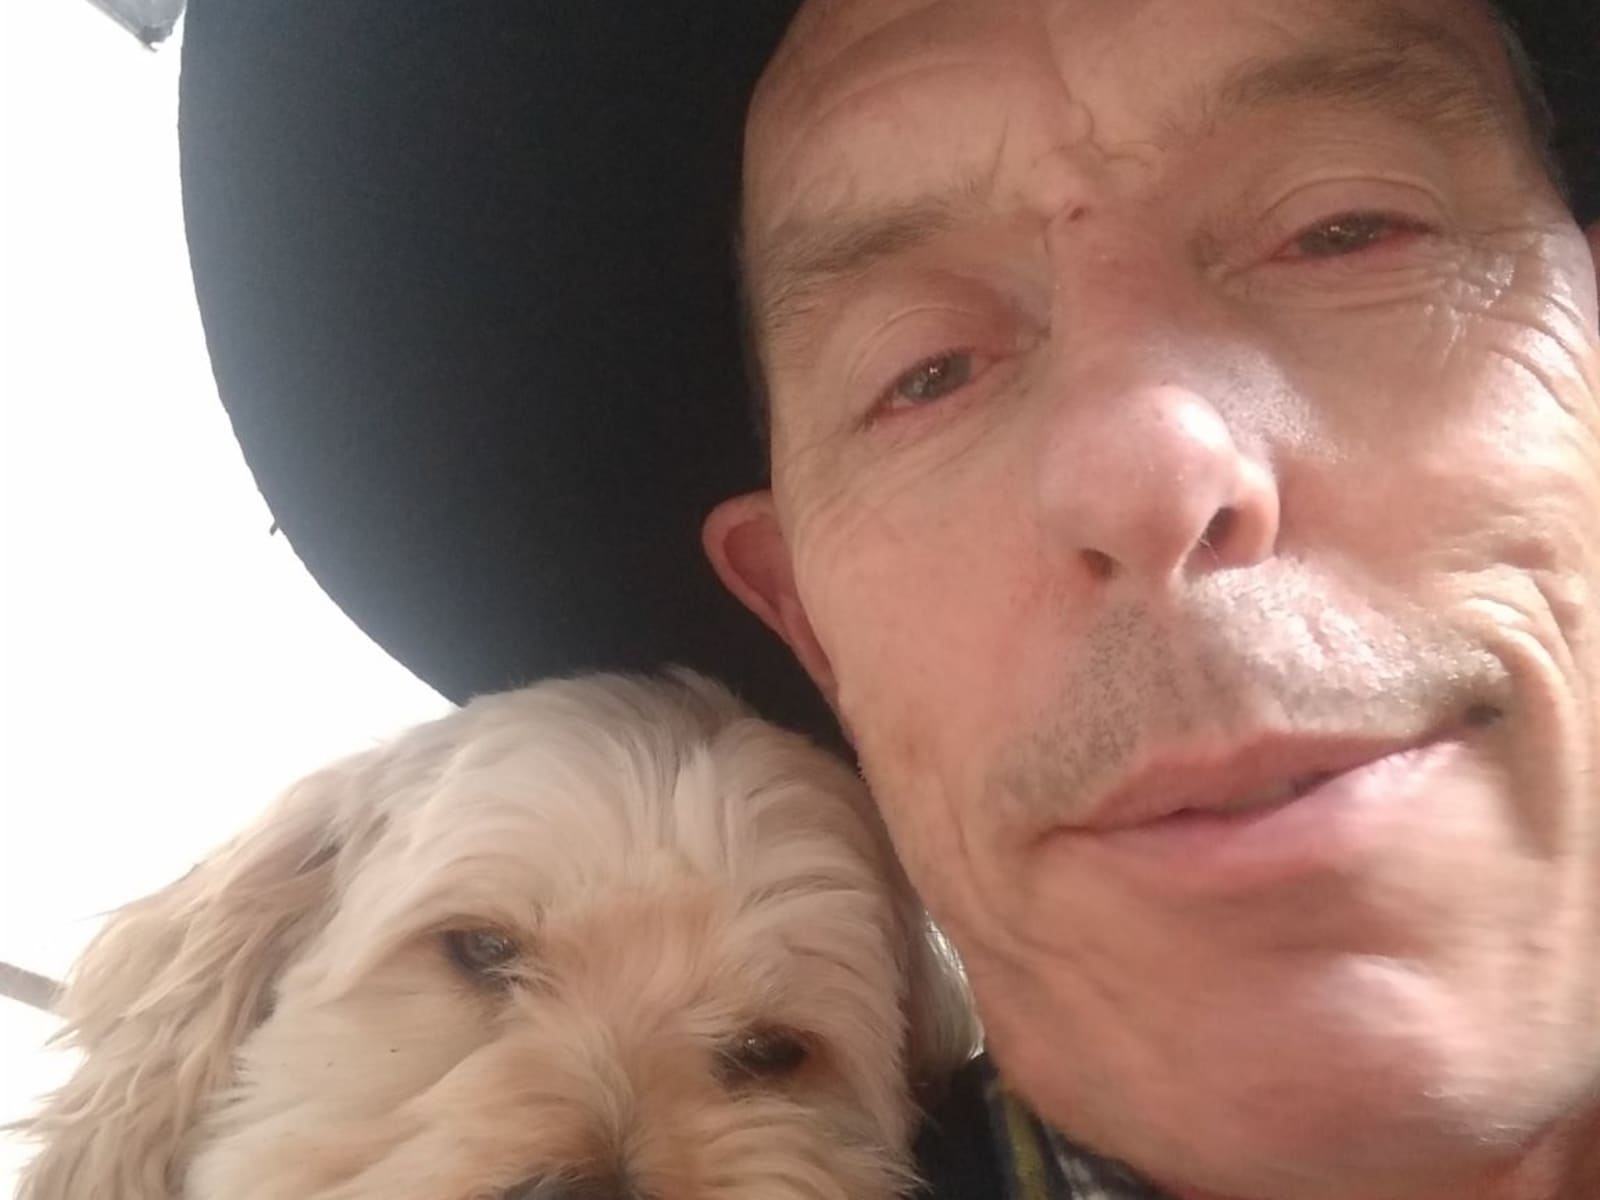 Michael from Thornbury, Victoria, Australia